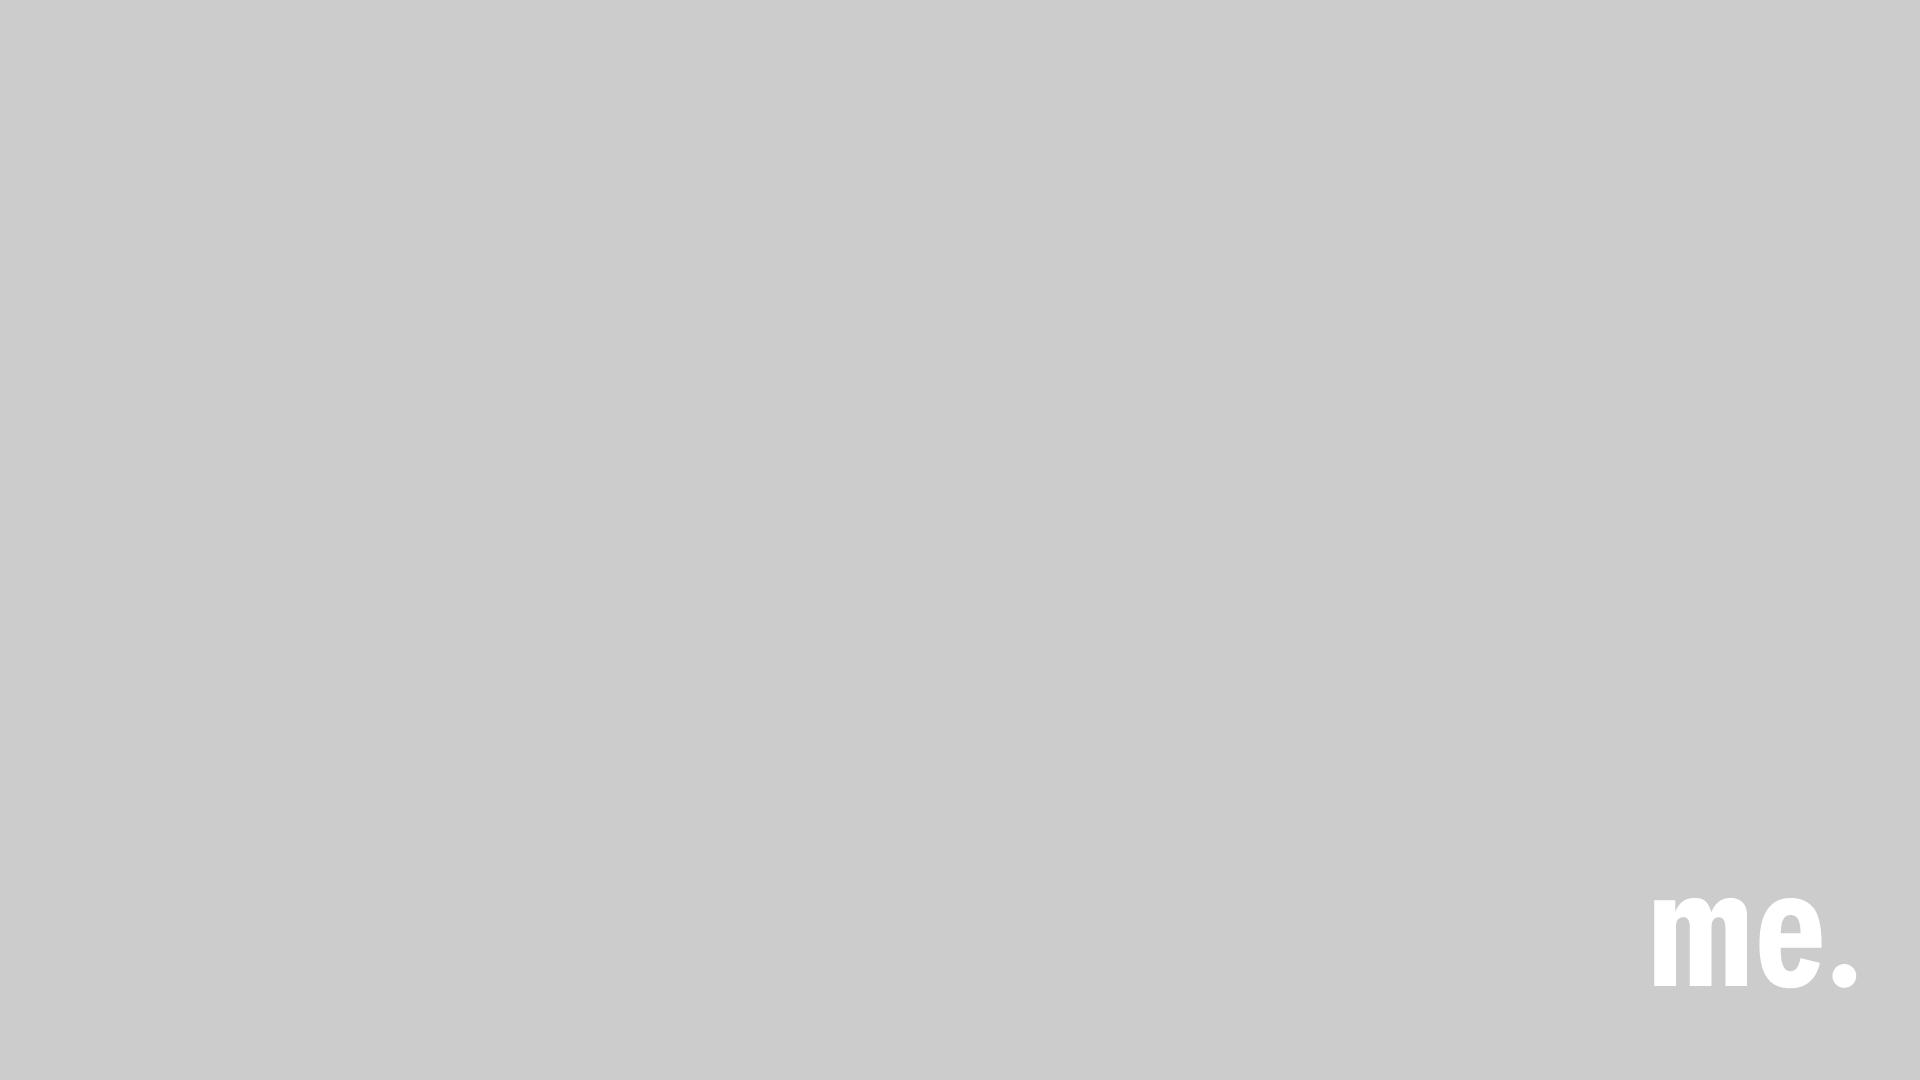 Thomas Mars, Deck d'Arcy, Laurent Brancowitz, Christian Mazzalai, Thomas Bangalter, Guy-Manuel de Homem-Christo: Phoenix und